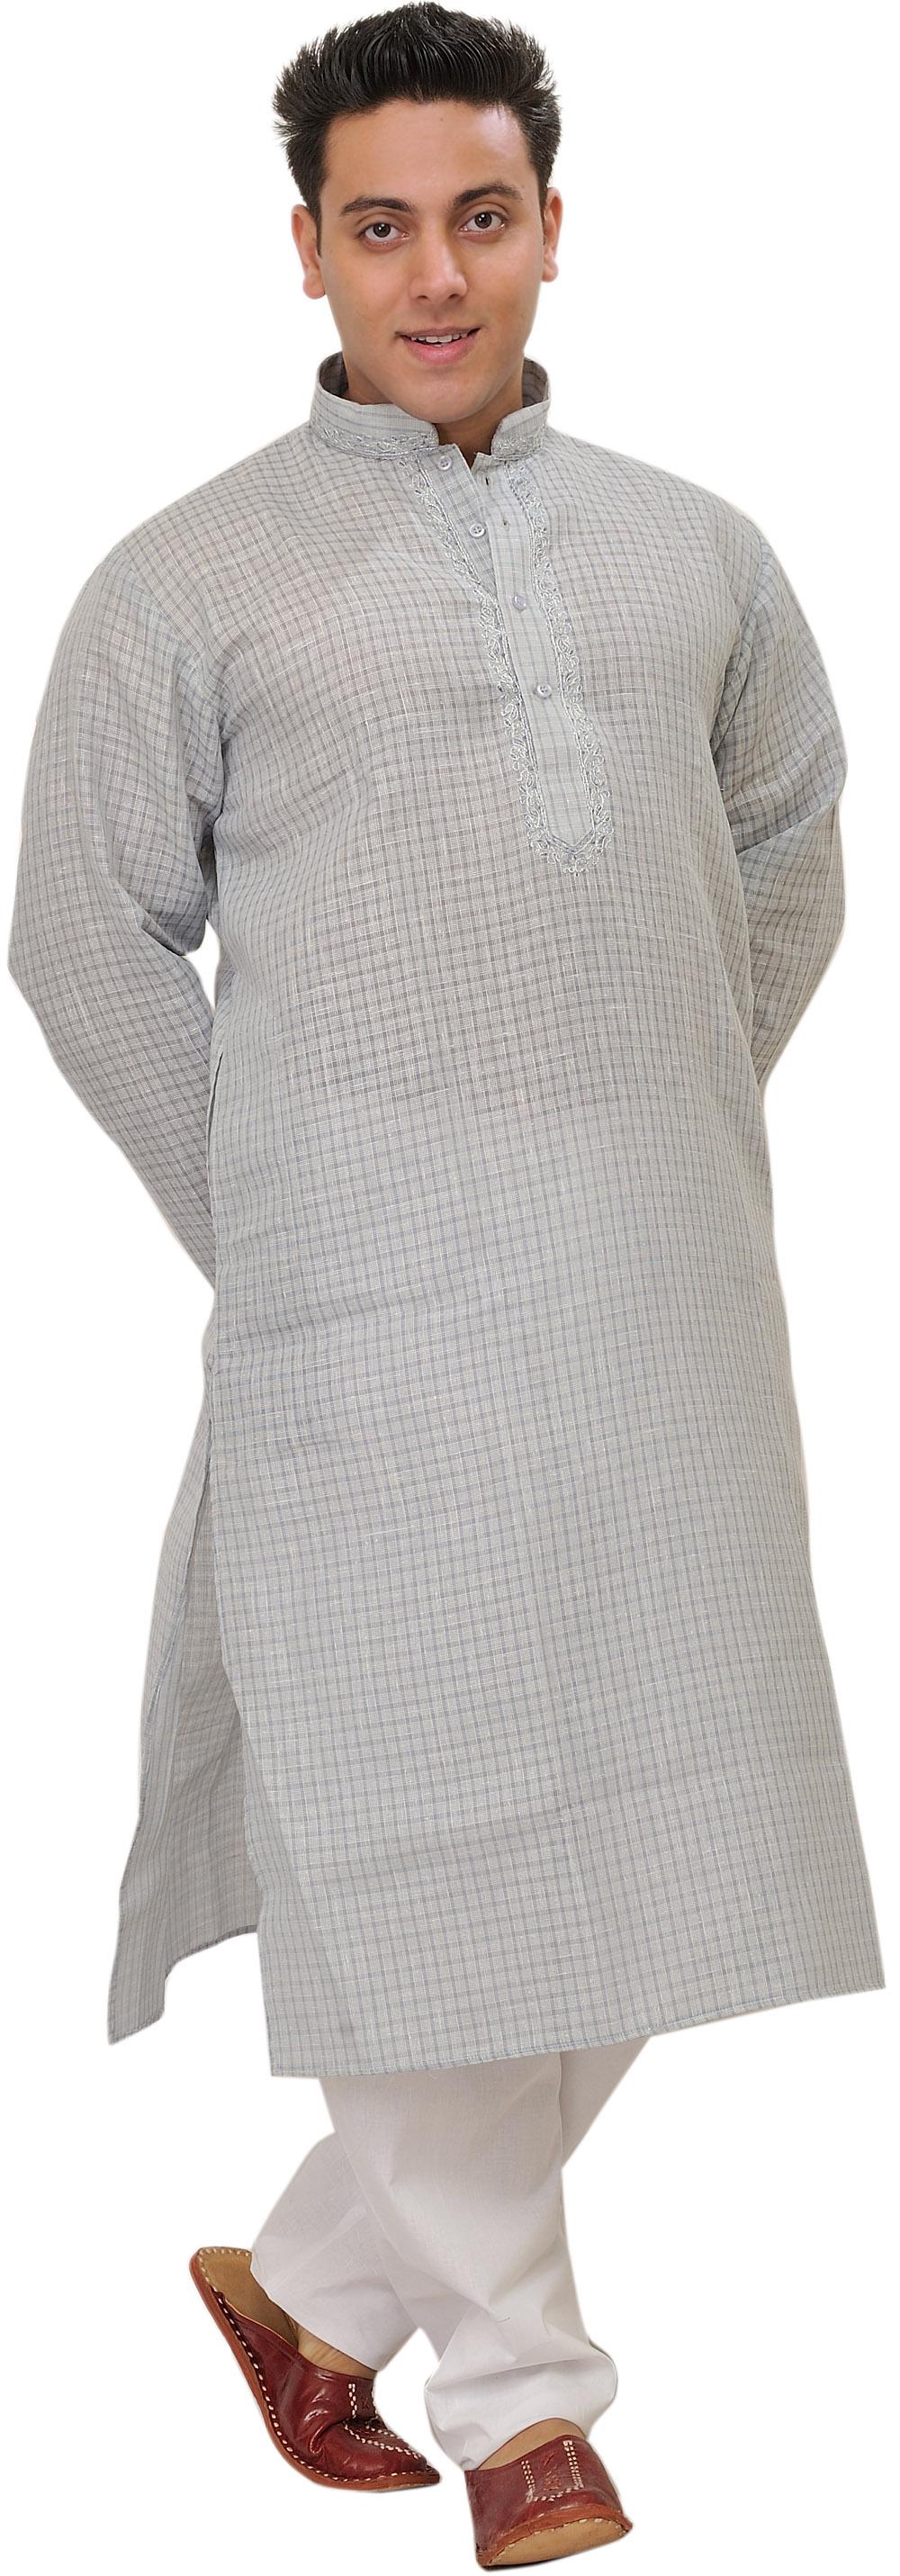 Kurta Pajama With Woven Checks And Embroidery On Neck